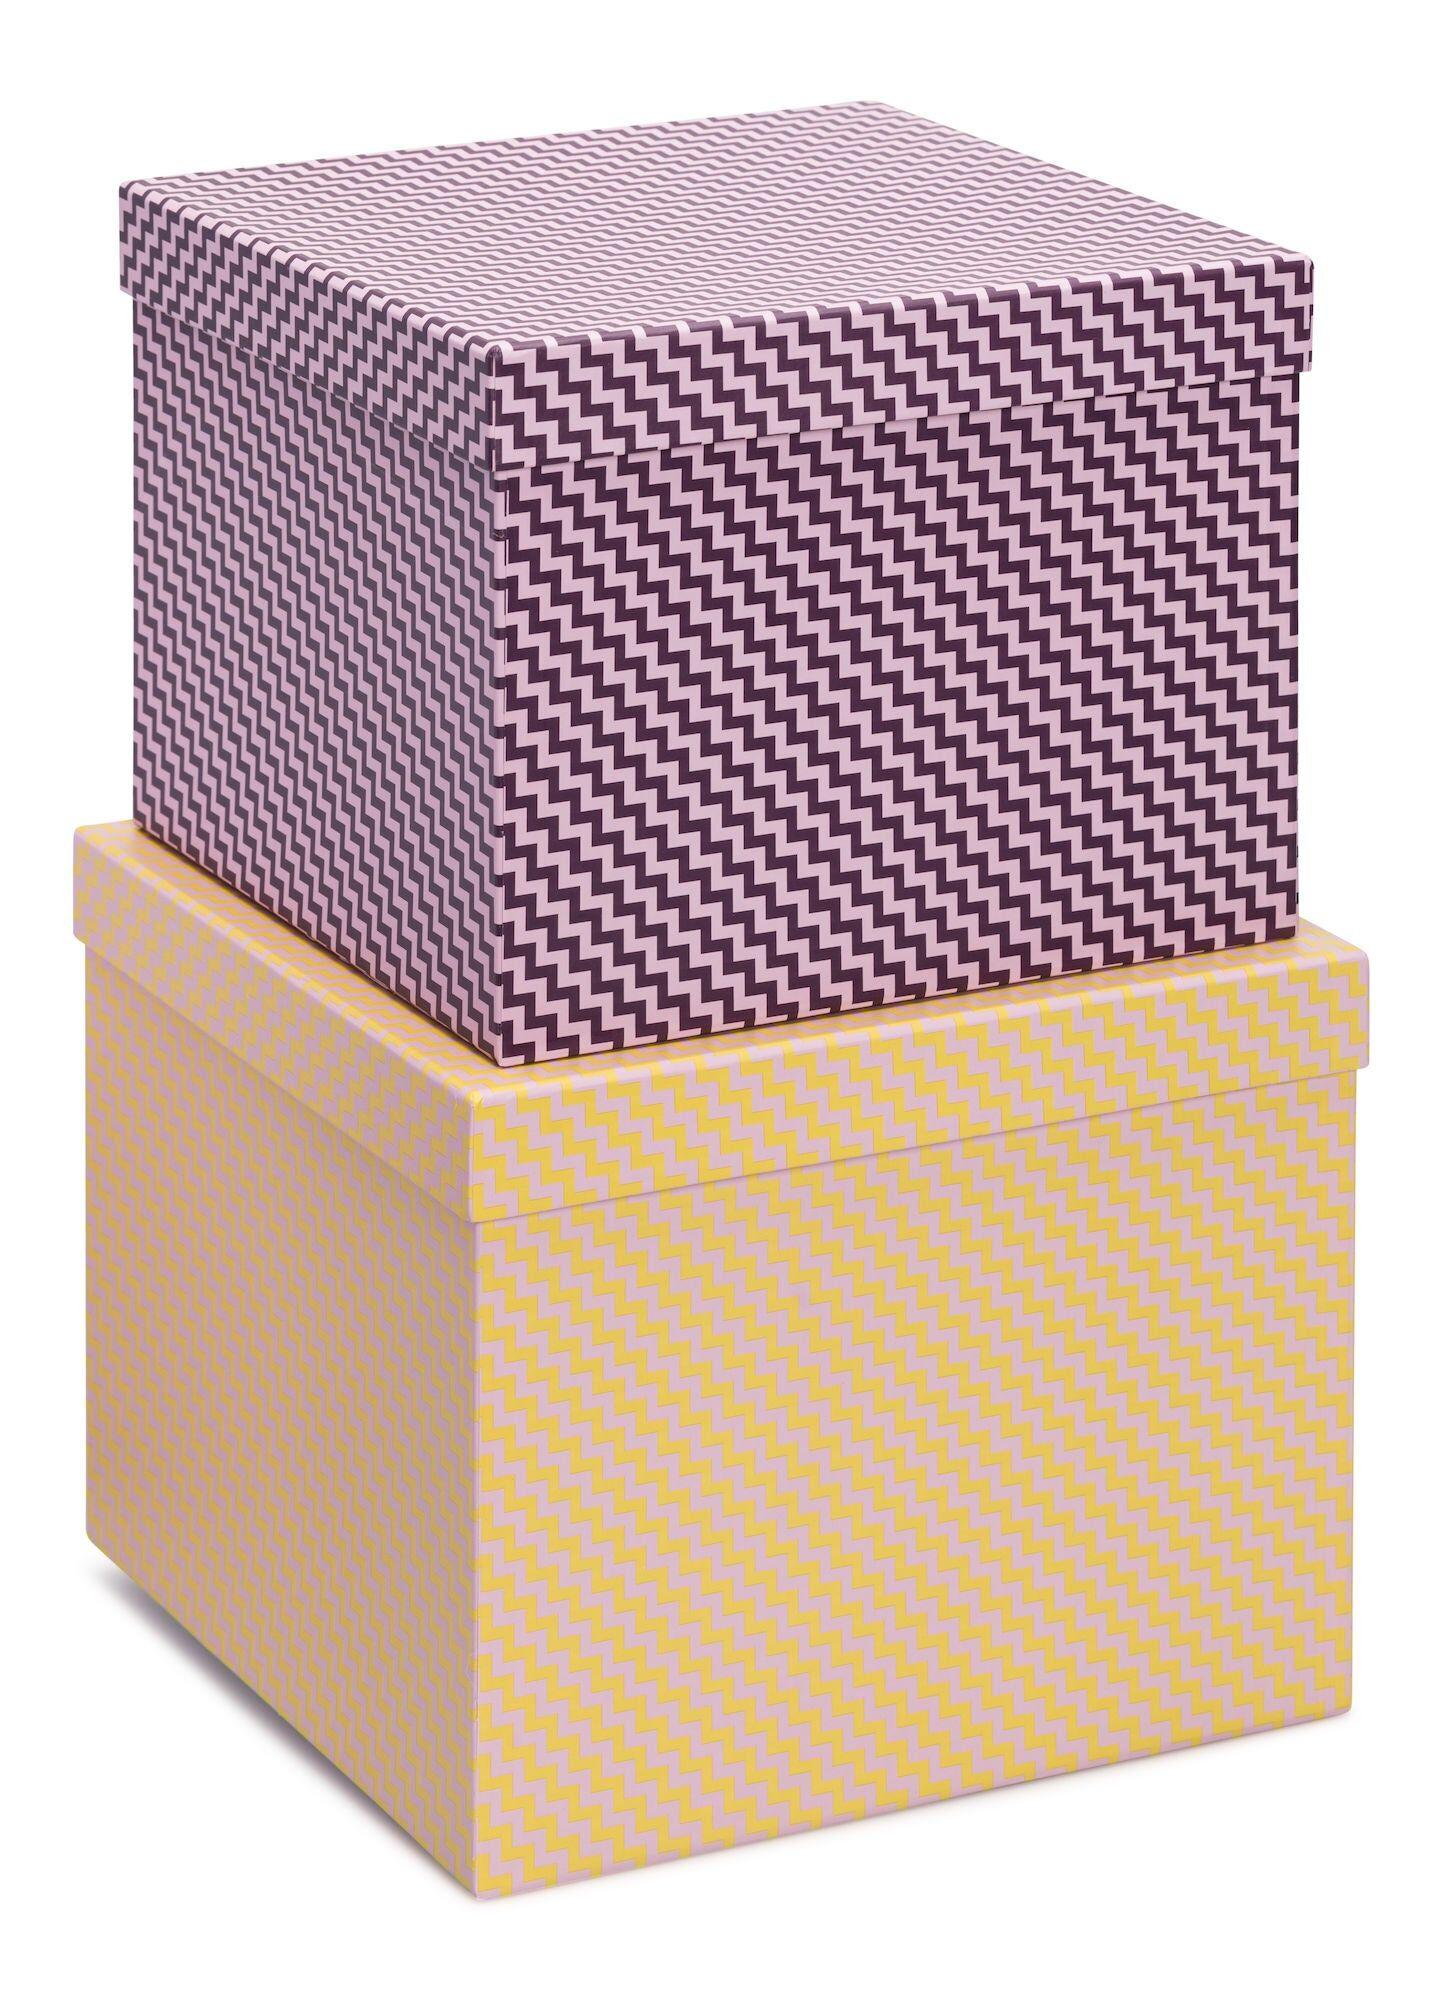 Petite Déco Oppbevaringsboks Kvadrat Damaskus 2-Pack, Gul/Rosa